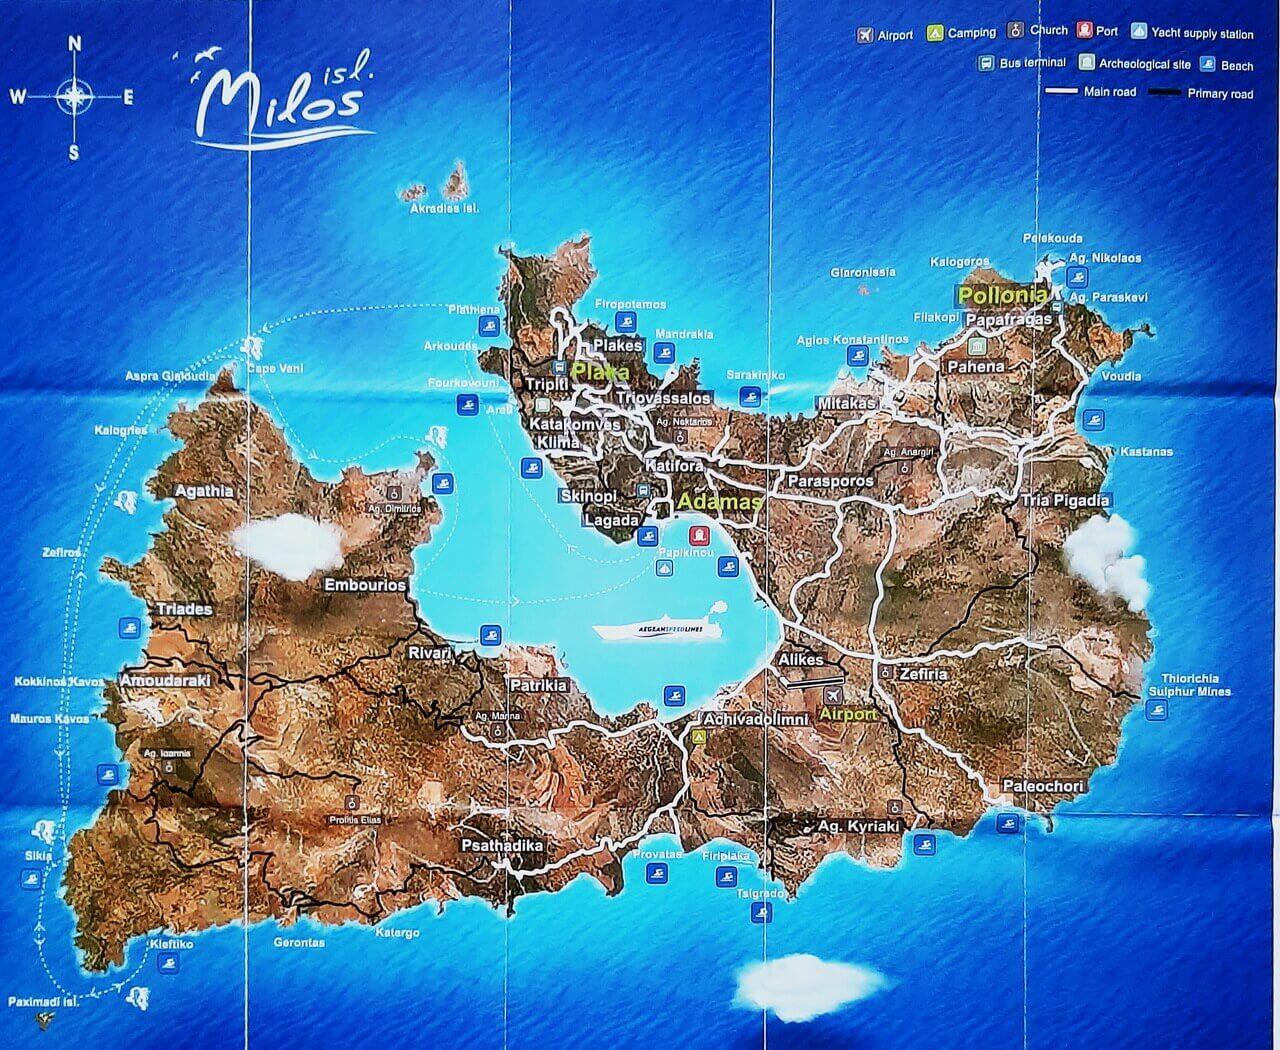 Milos map